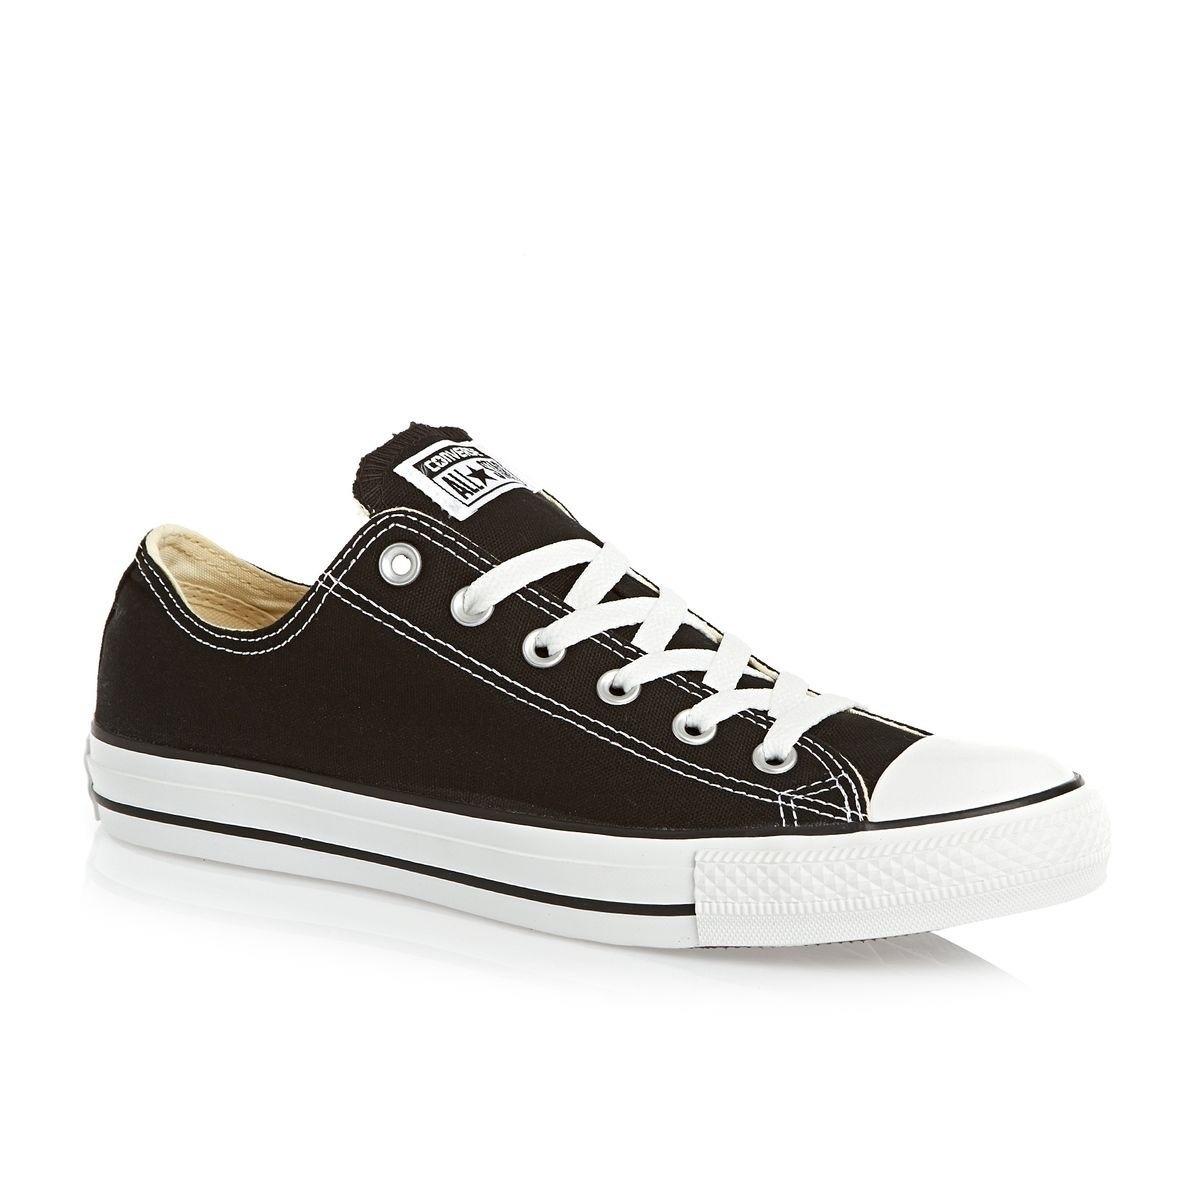 Tienda Zapatos All Fisica 78wzxpqwx Vzla Bs Plaza Negros Star Converse b7gvyYf6